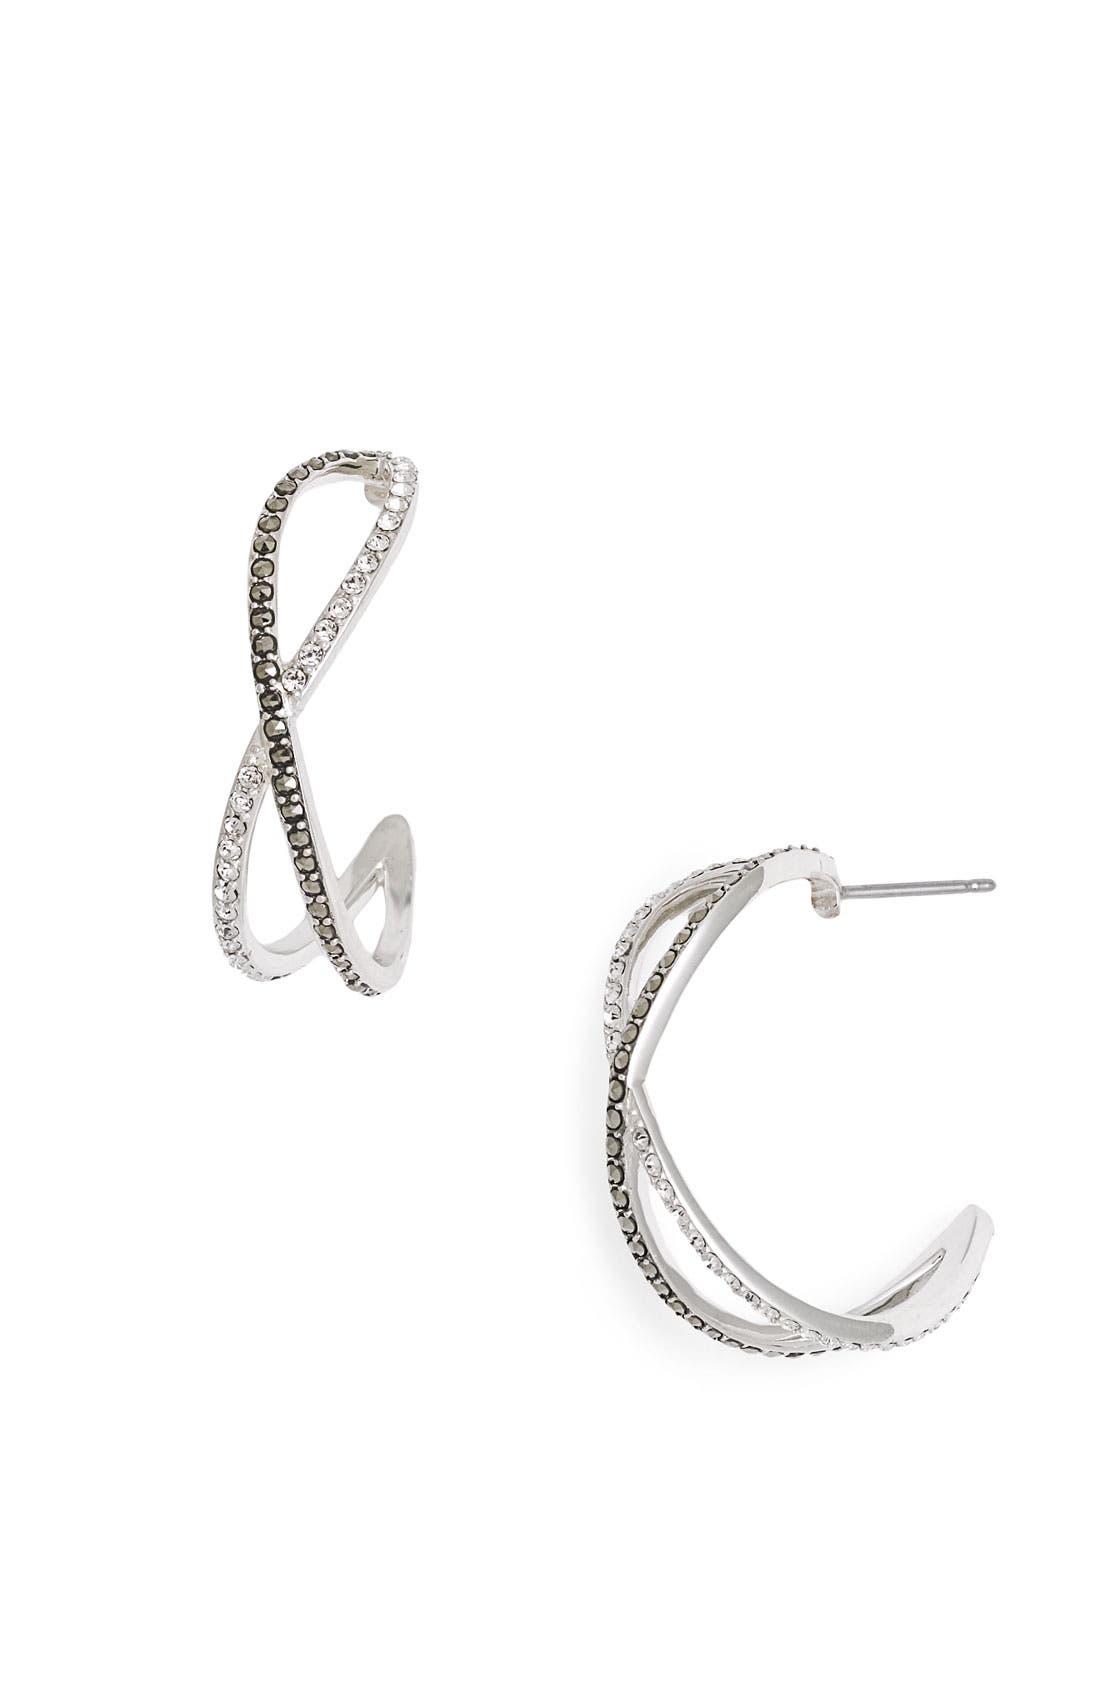 Main Image - Judith Jack 'Licorice' Small Hoop Earrings